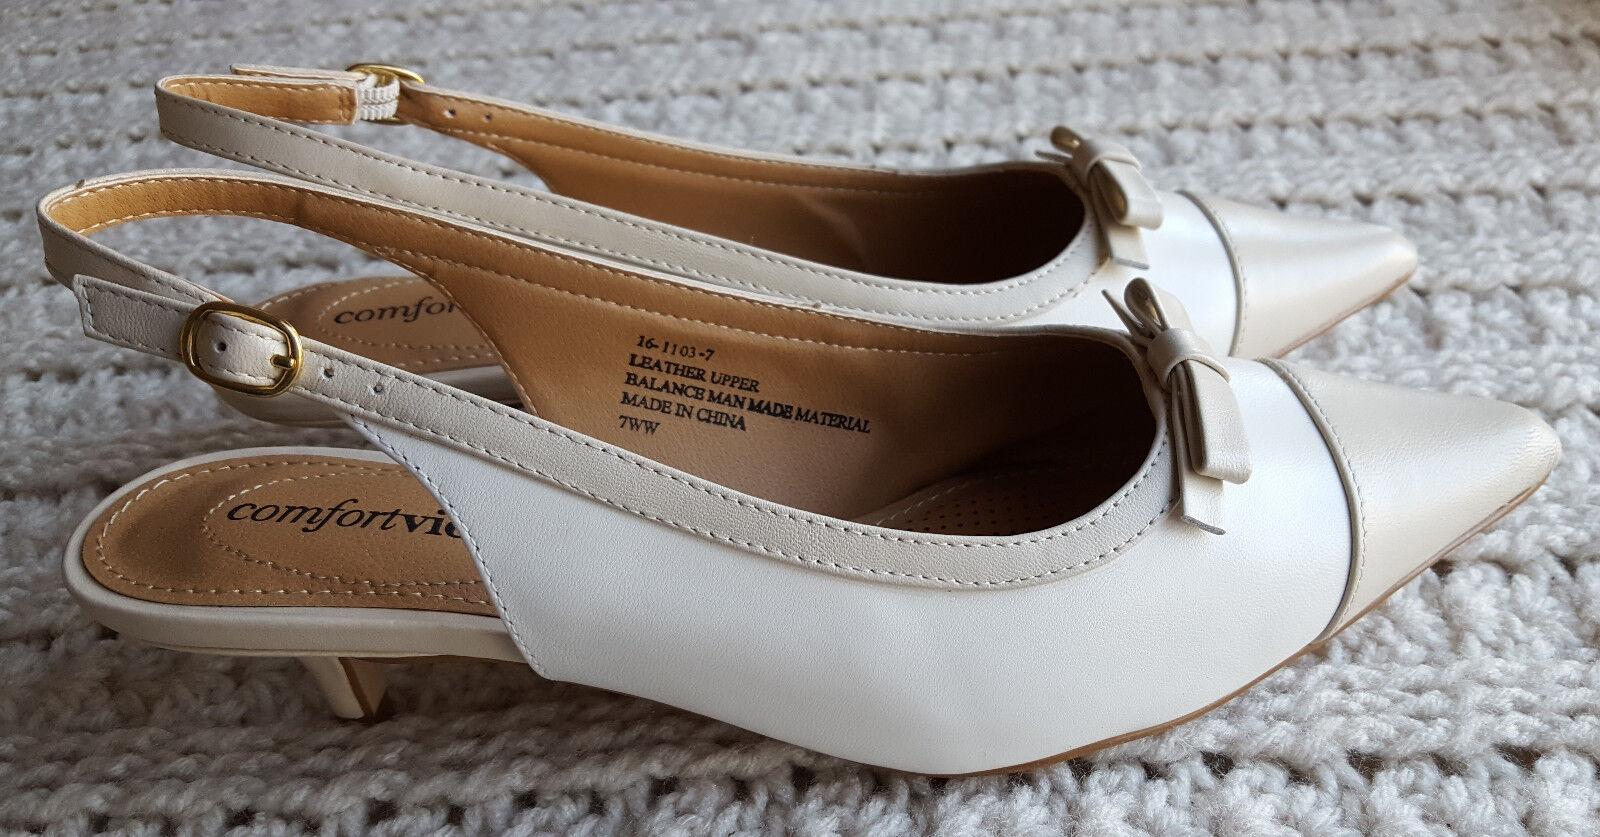 Kim Slingback Casual Heels Leather Oatmeal Ivory/Beige Size Choice Comfortview